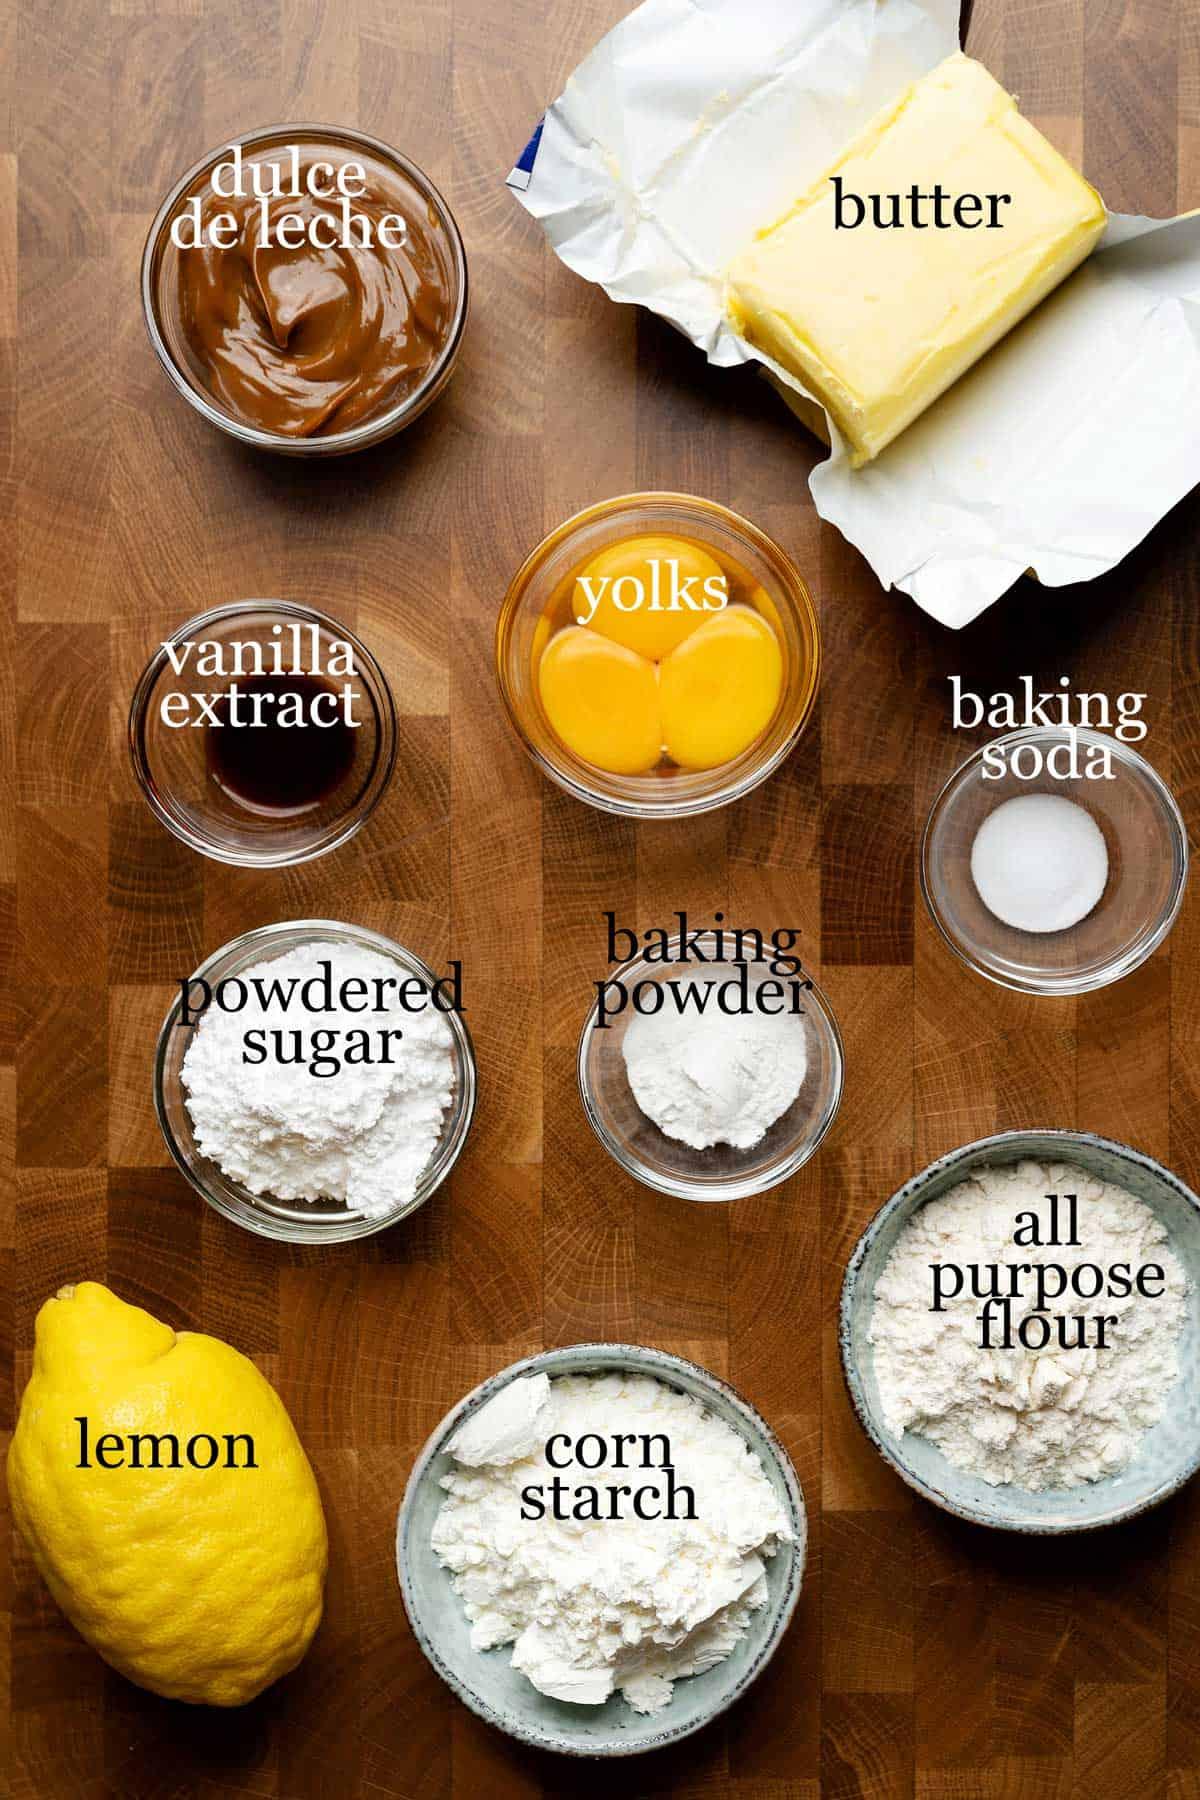 Ingredients to make Argentine alfajores